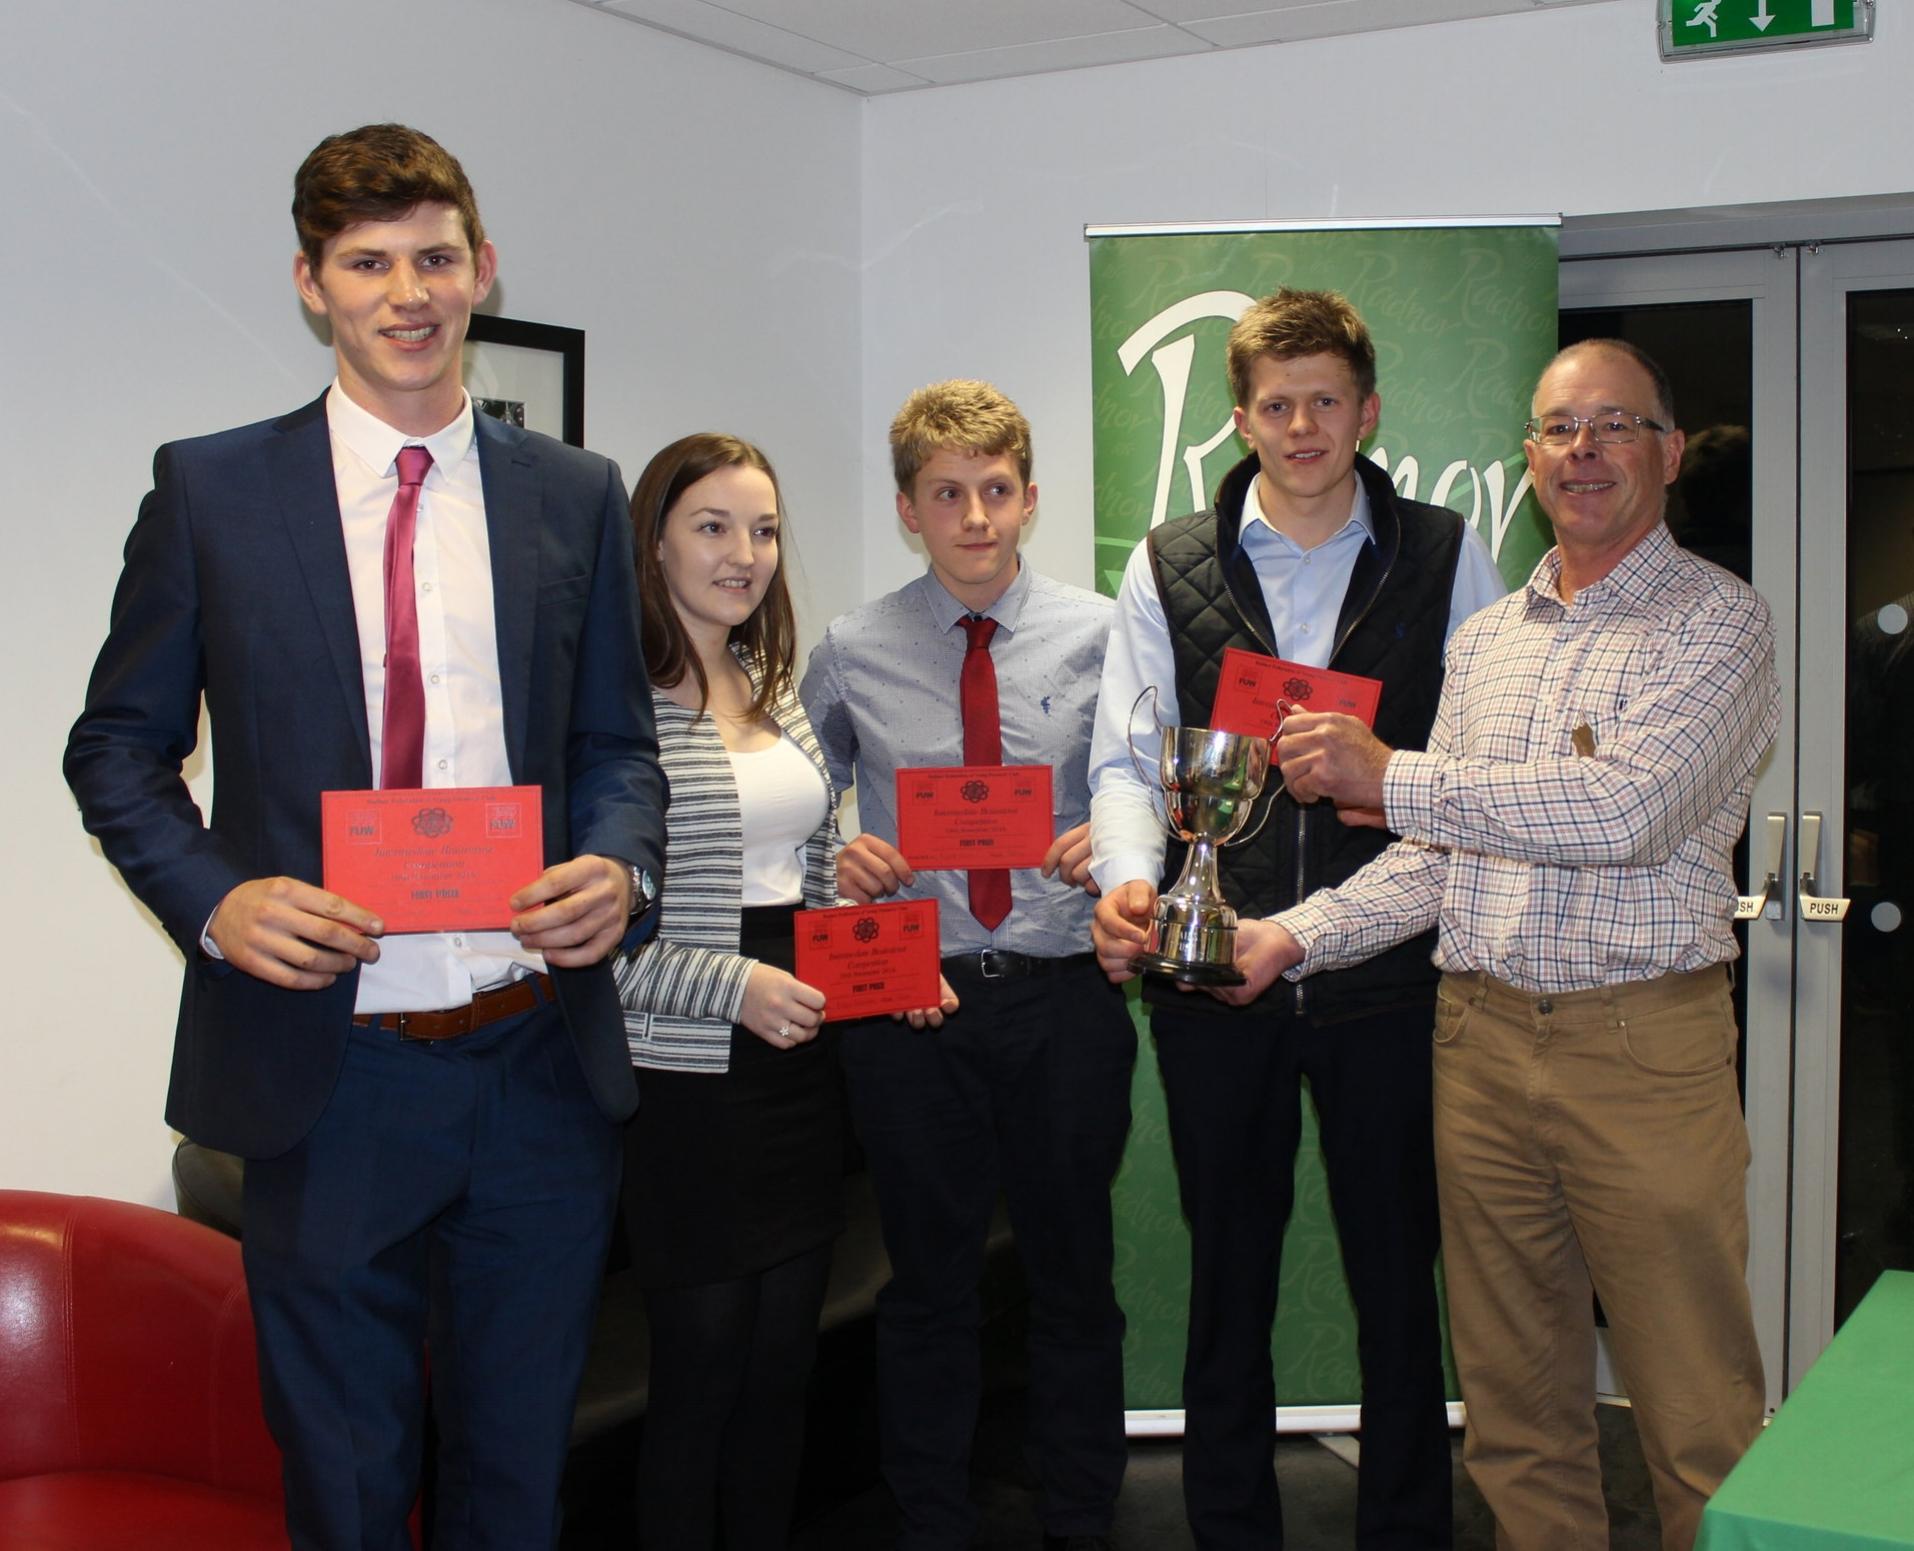 1st in the Intermediate Brainstrust Will Lewis, Rhian Griffiths, Rupert Owen & Ben Owen with Judge Mr Ifor Humpreys.